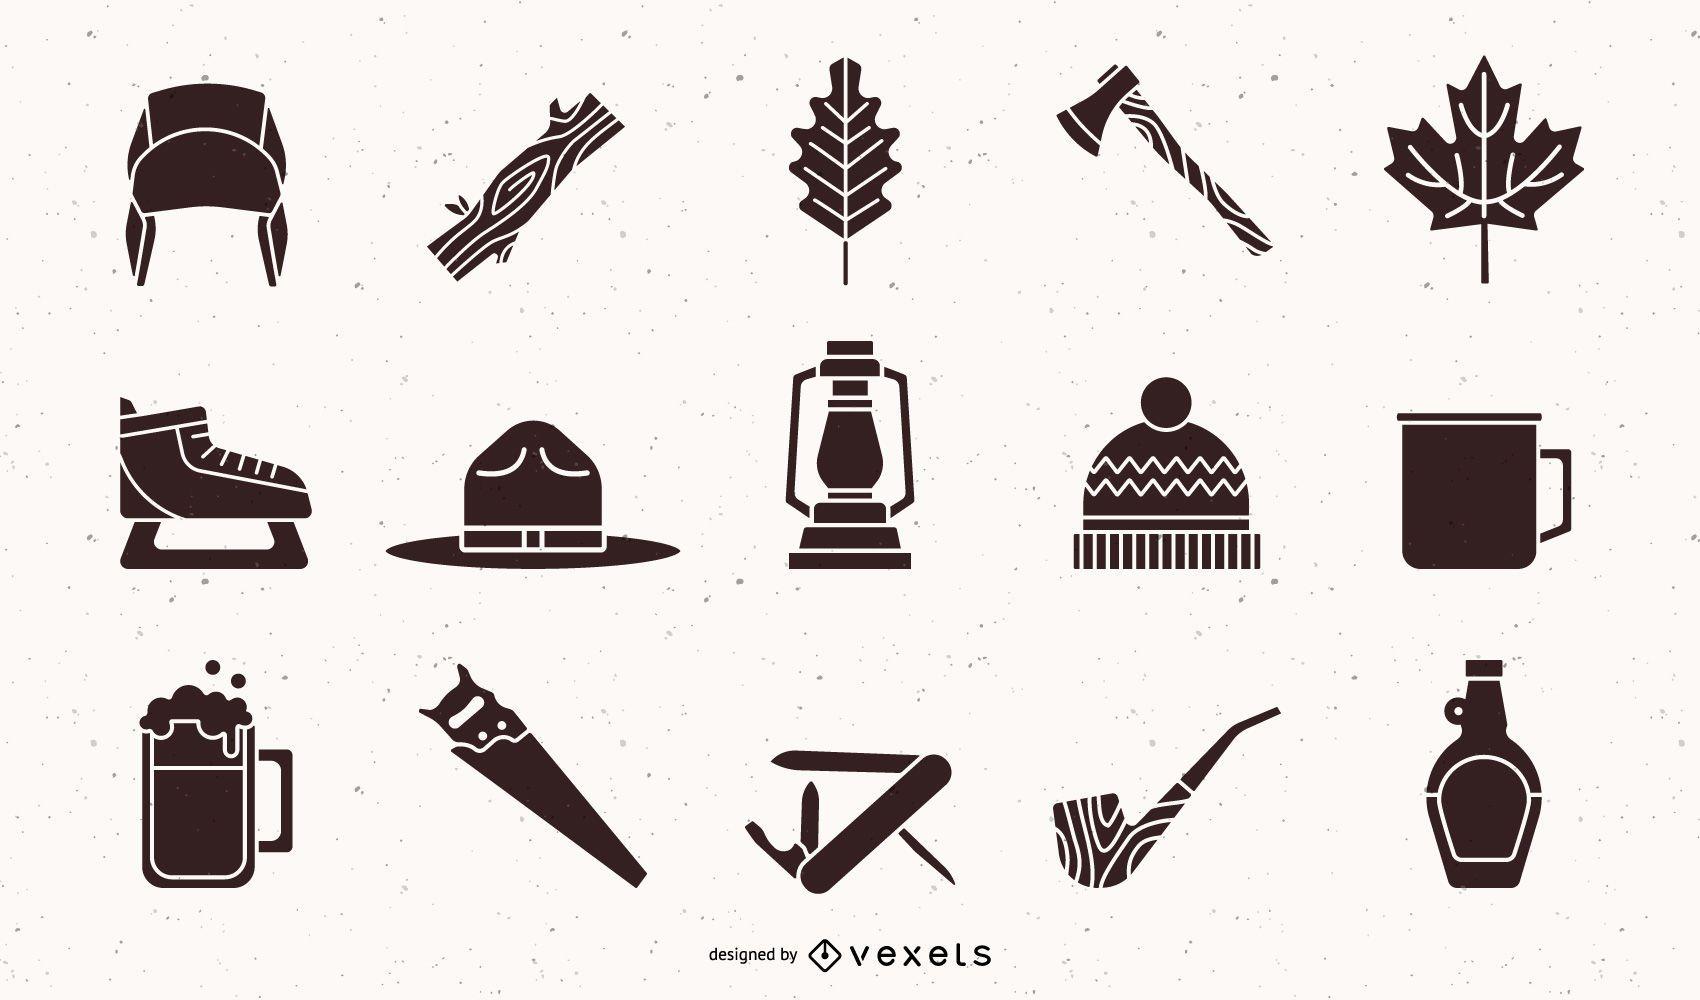 Pacote de design de elementos de silhueta de lenhador